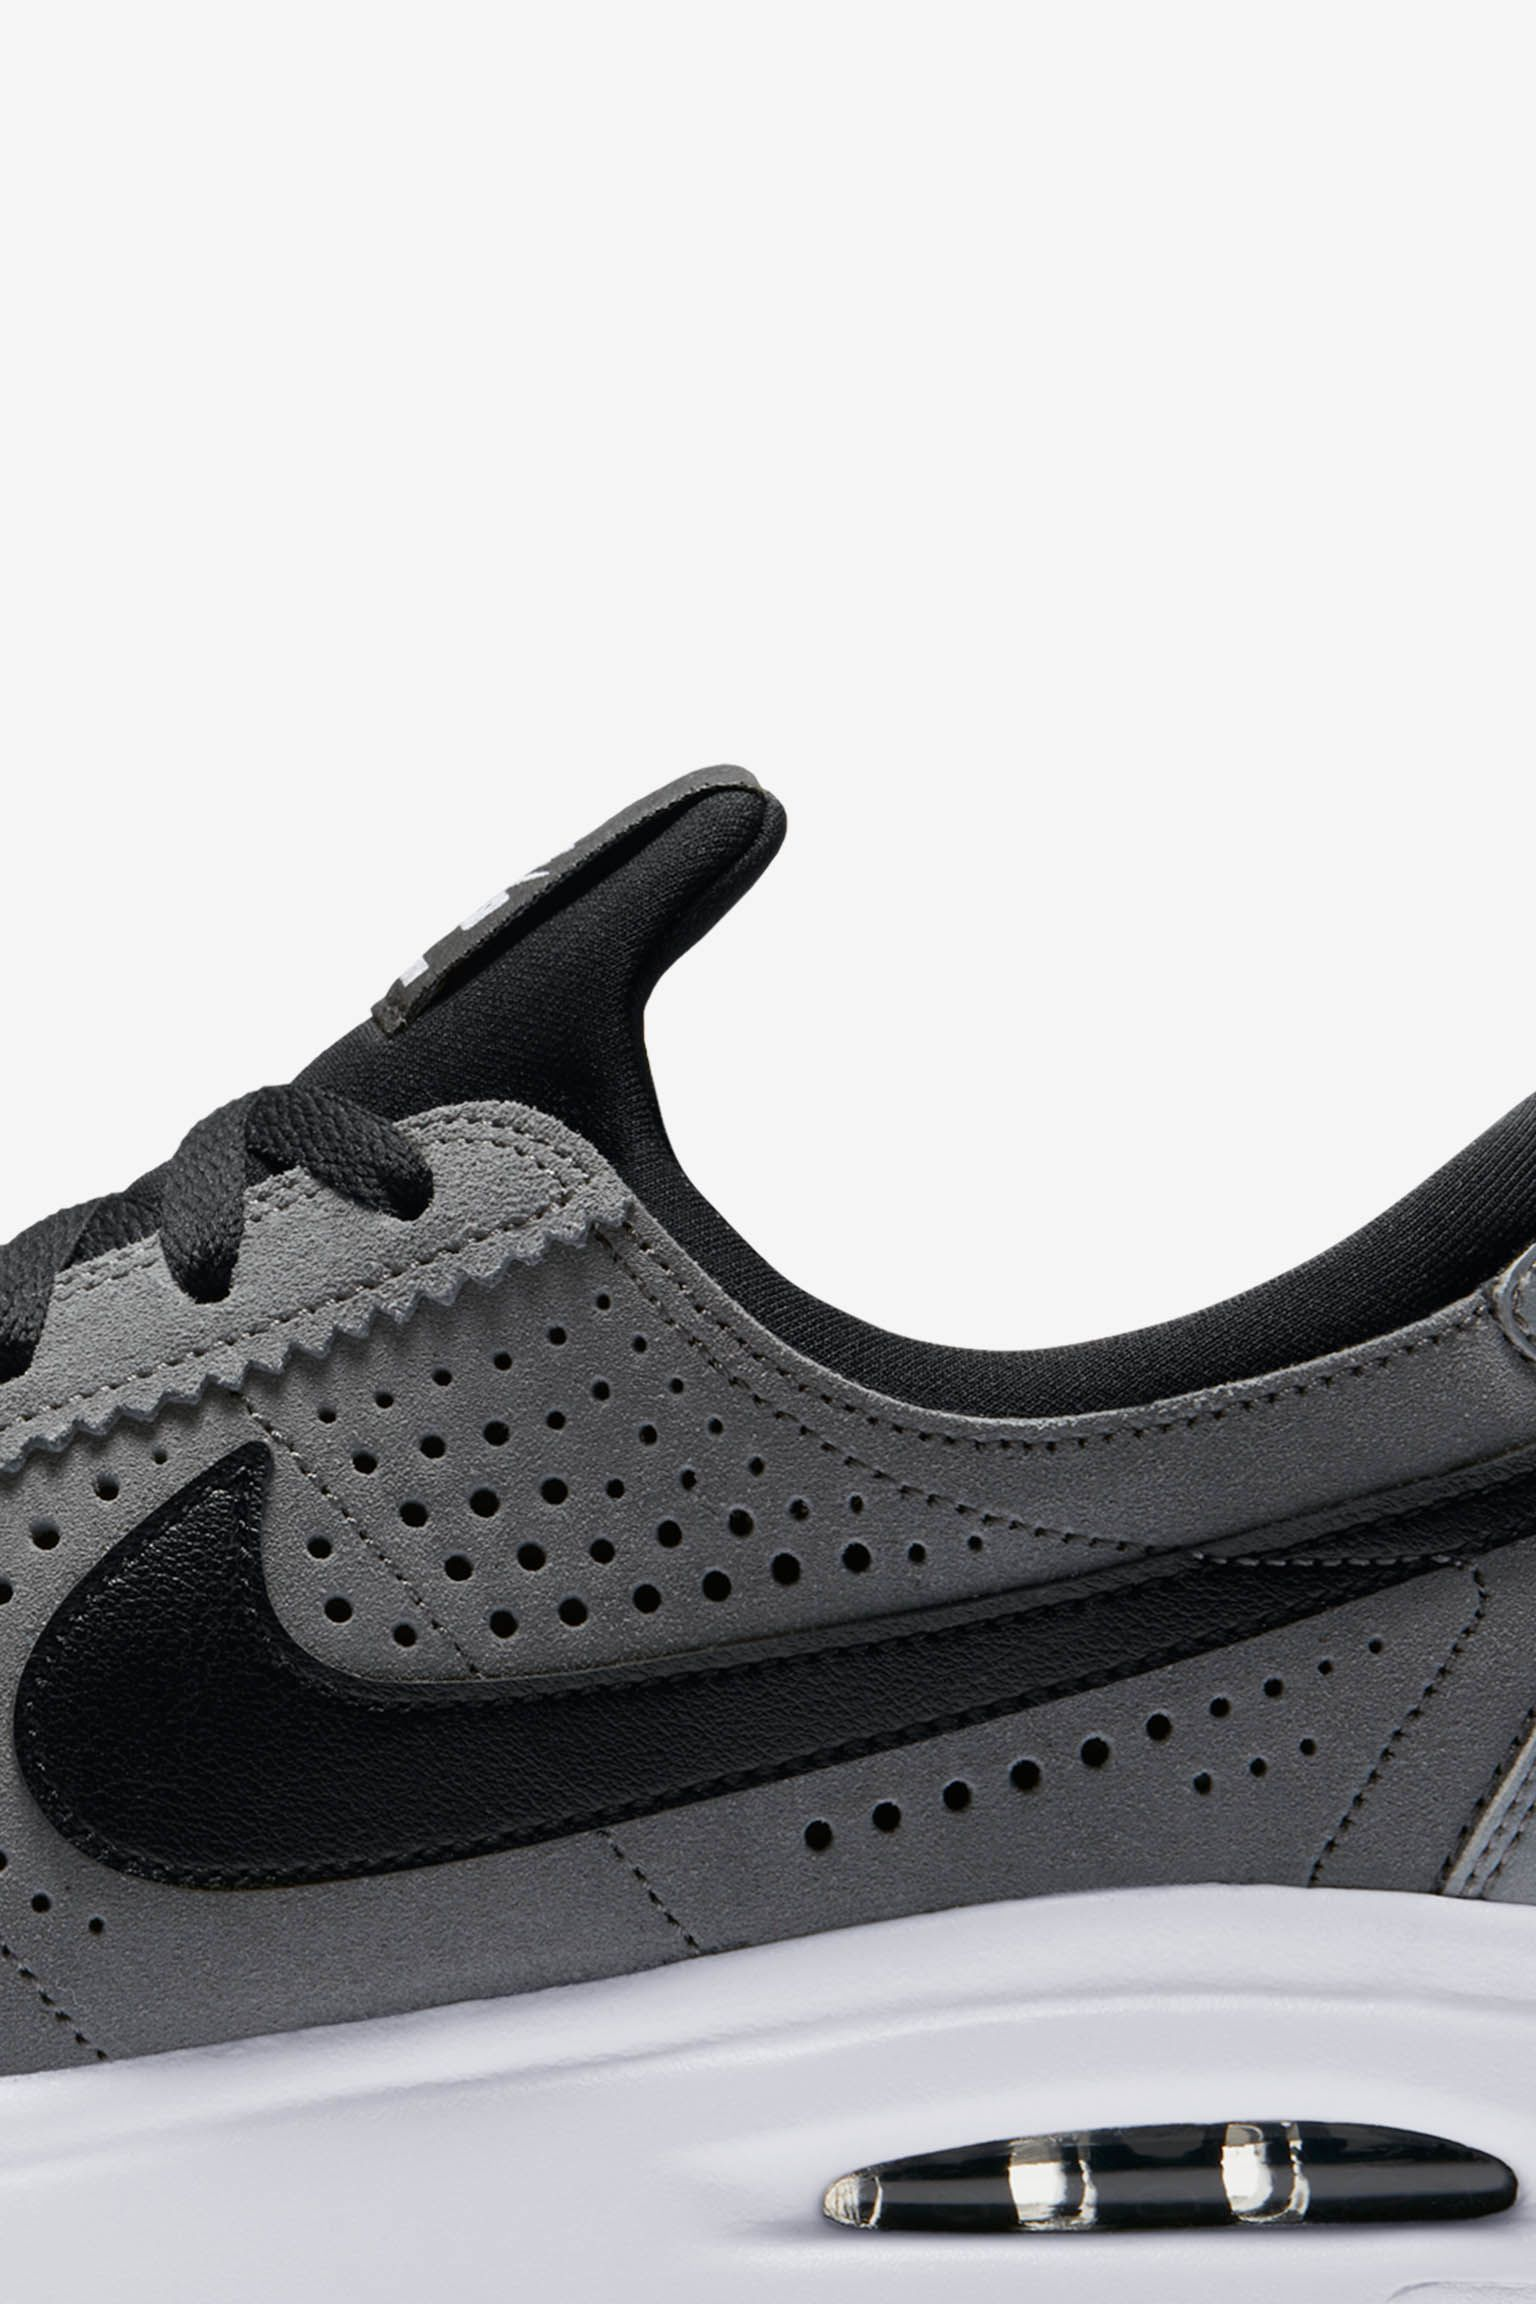 Nike SB Air Max Bruin Vapor 'Cool Grey'. Nike SNKRS LU